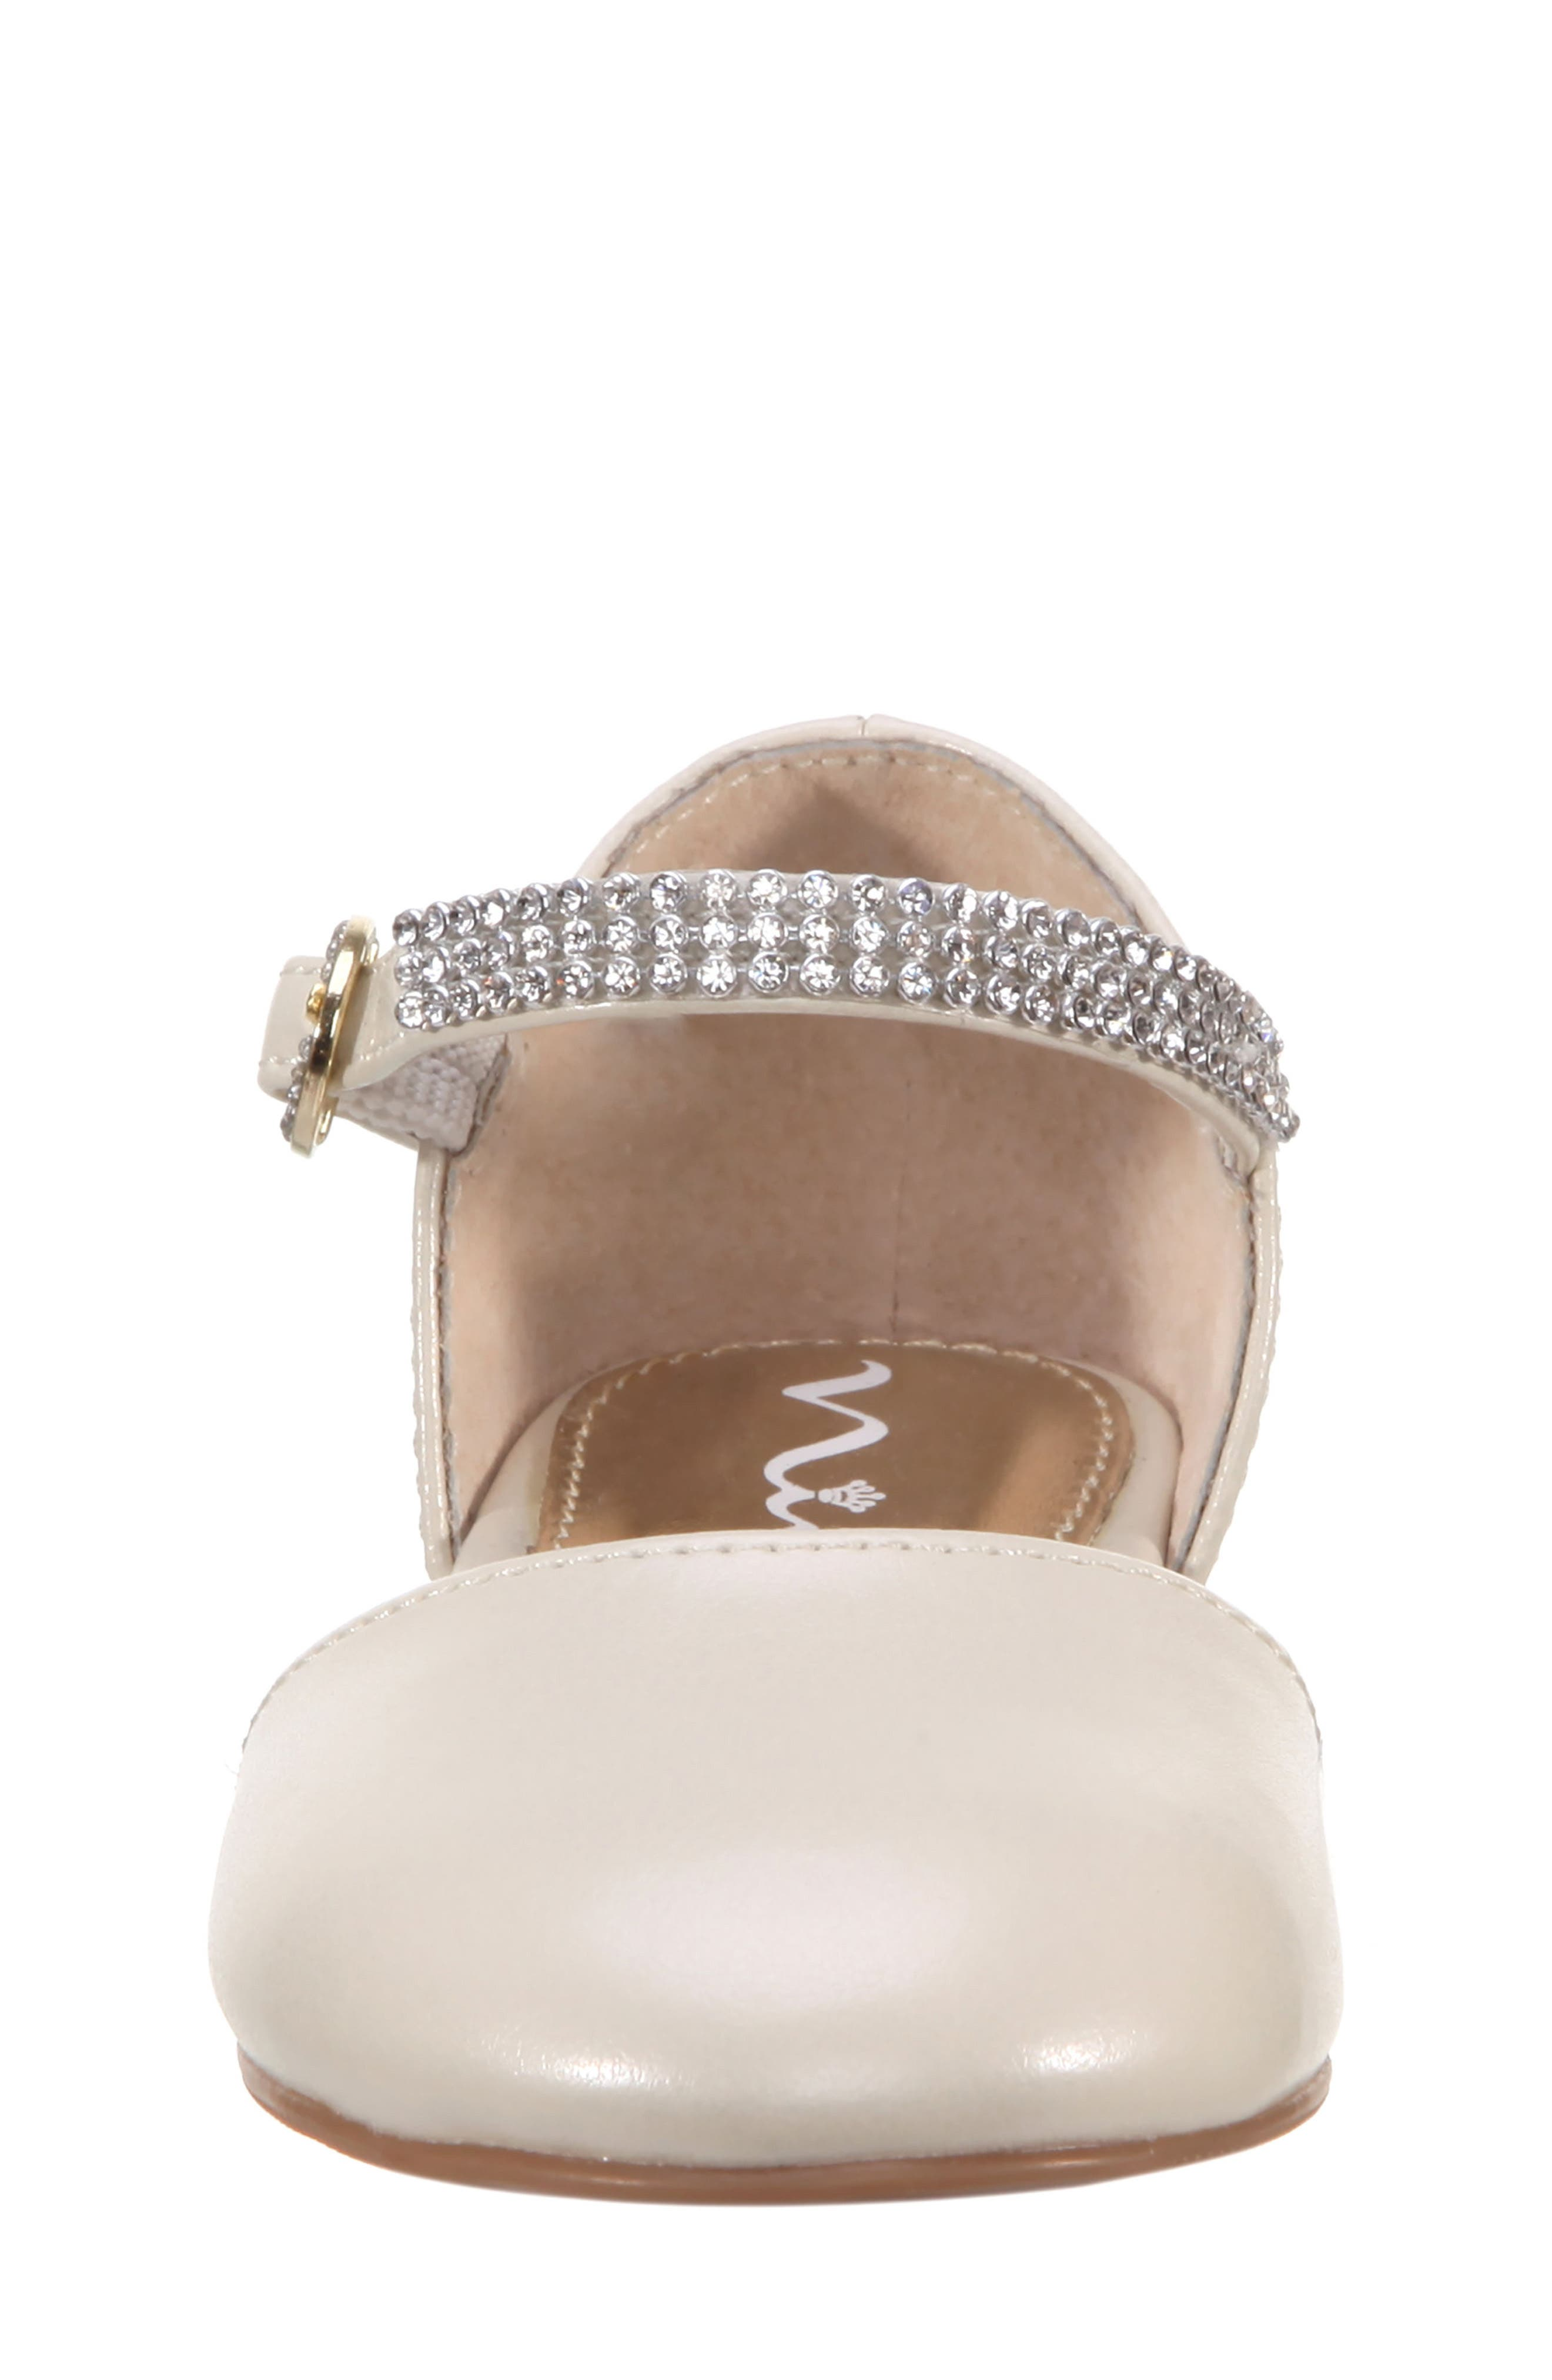 Cara Crystal Embellished d'Orsay Sandal,                             Alternate thumbnail 4, color,                             Bone Pearlized